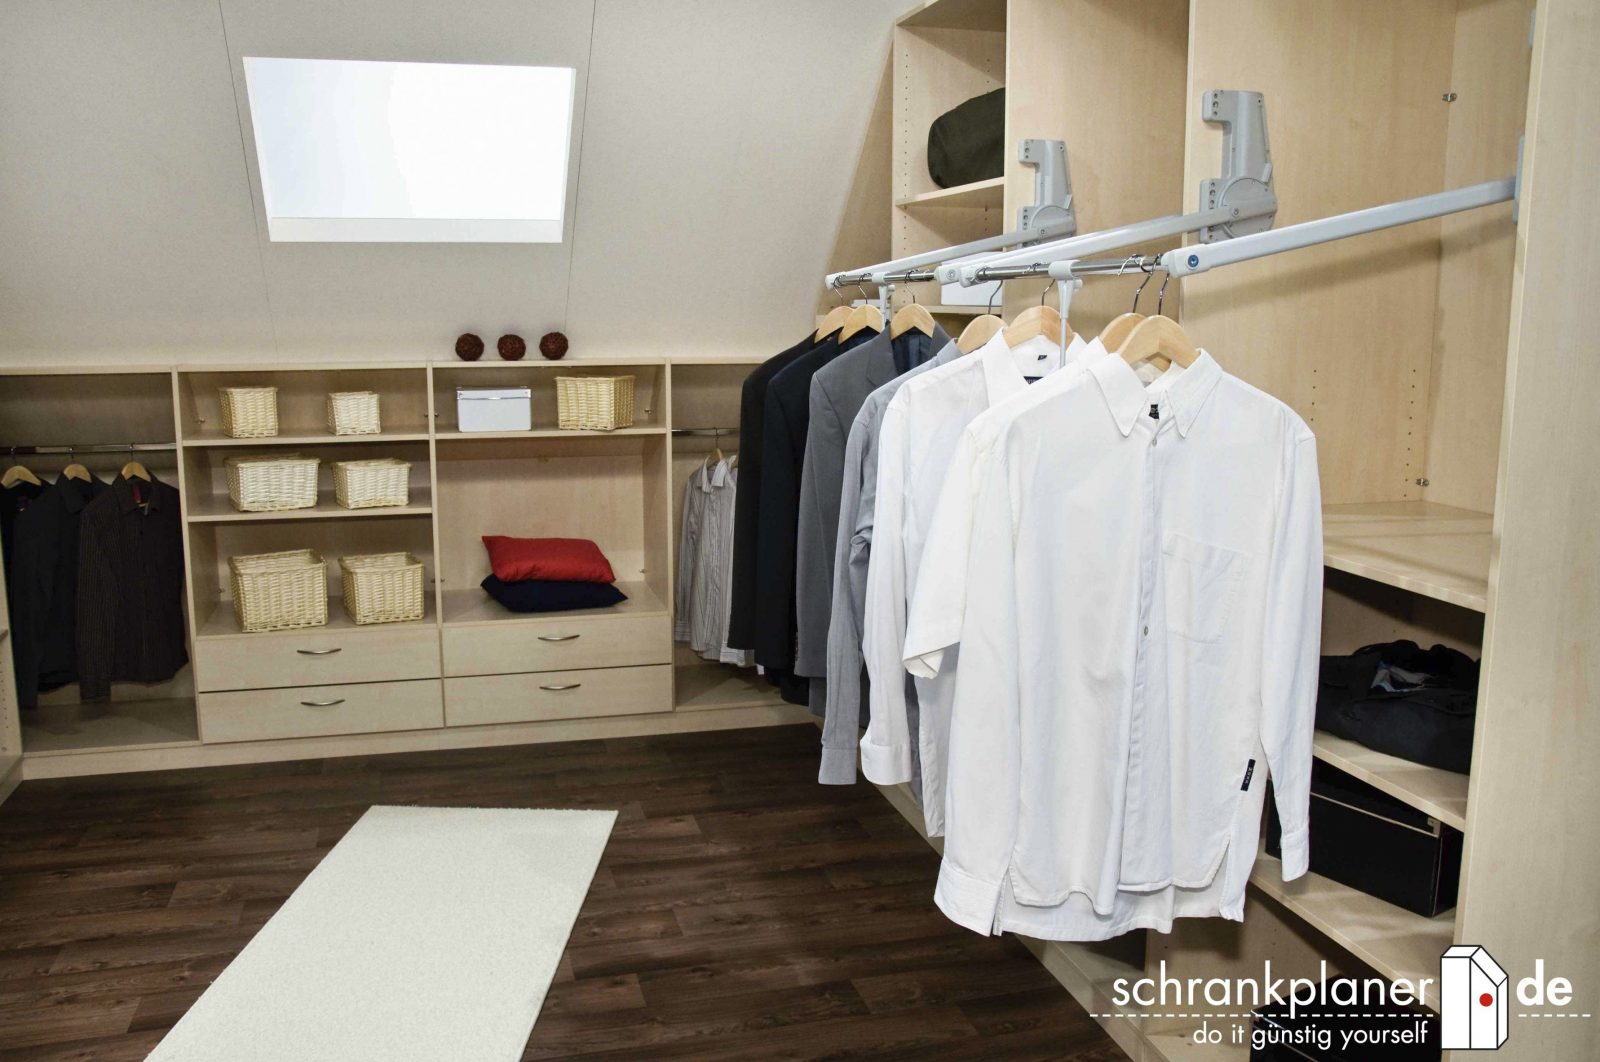 How To Decorate Begehbarer Kleiderschrank In Dachschräge Selber von Begehbarer Kleiderschrank Dachschräge Ikea Photo